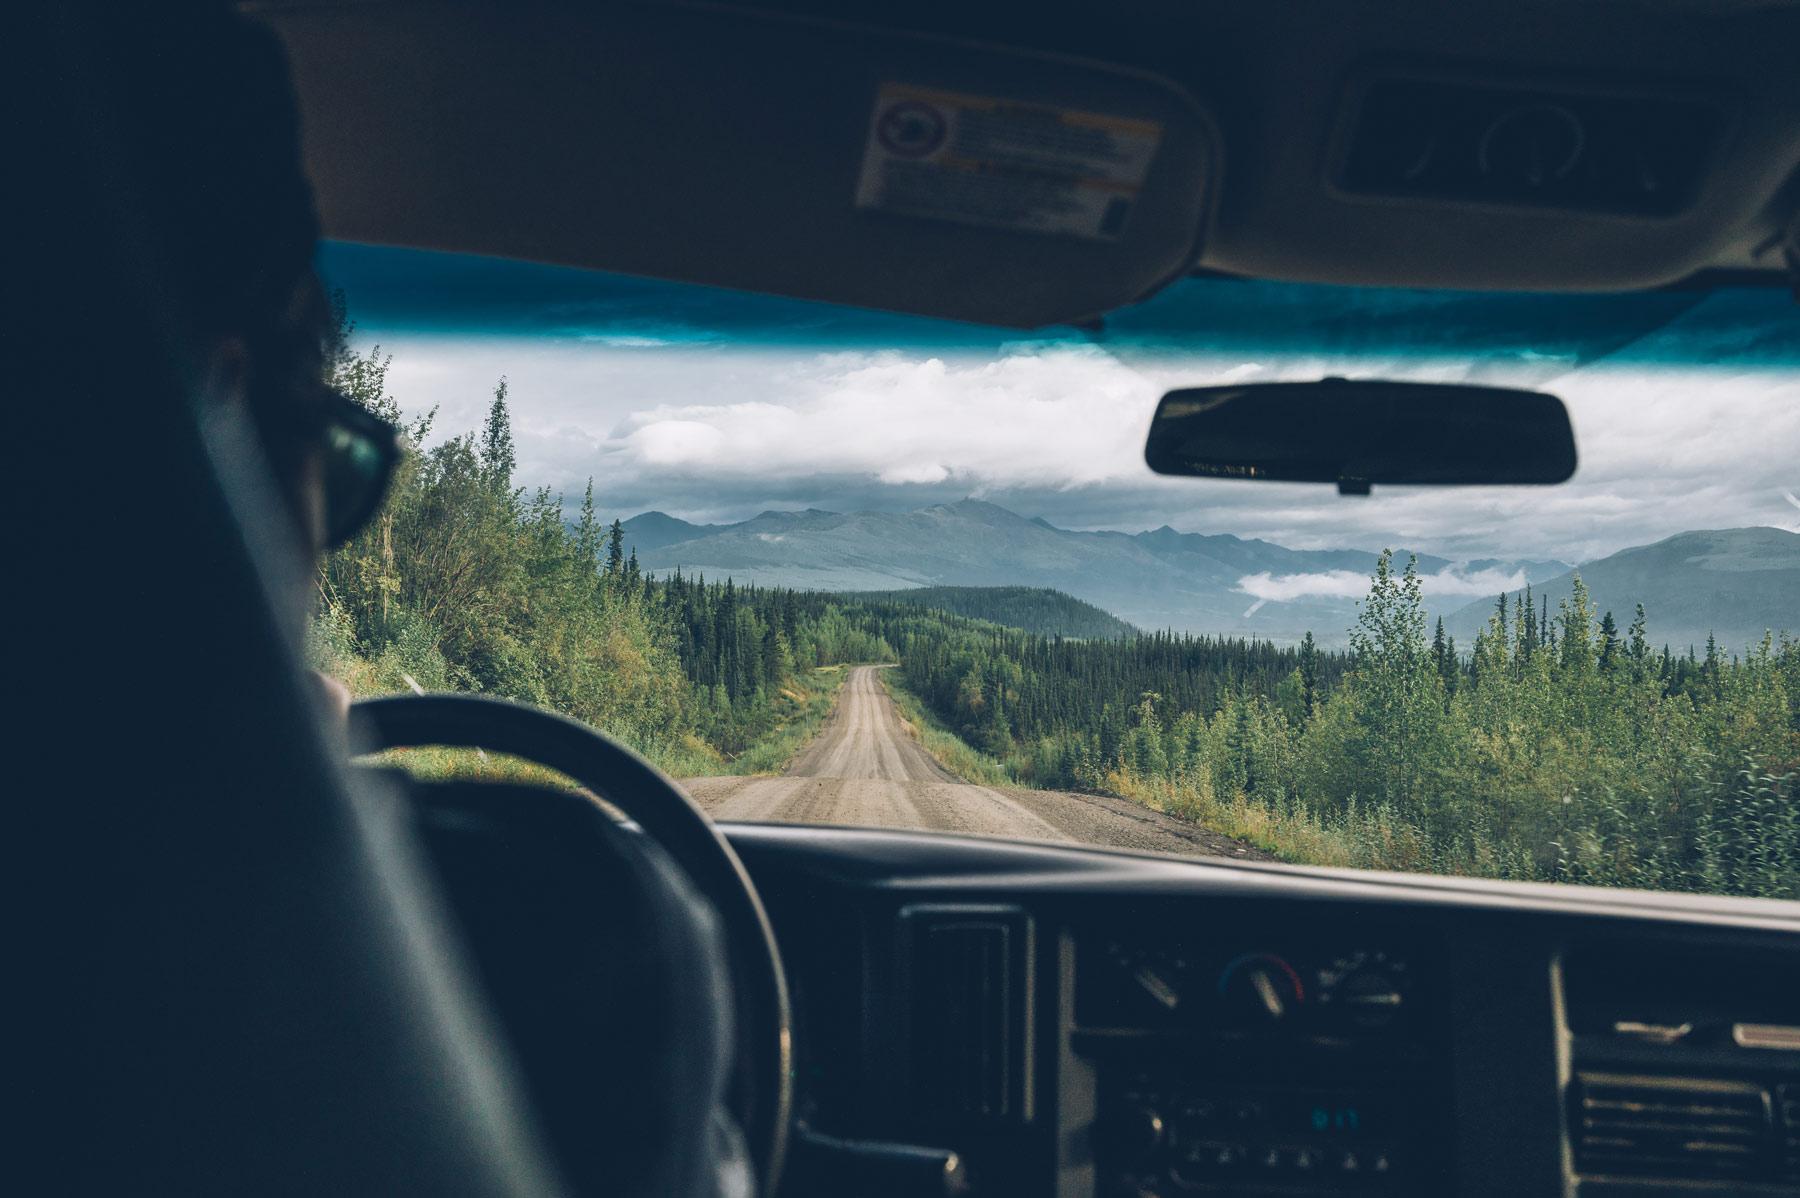 Dumpster Highway, Yukon